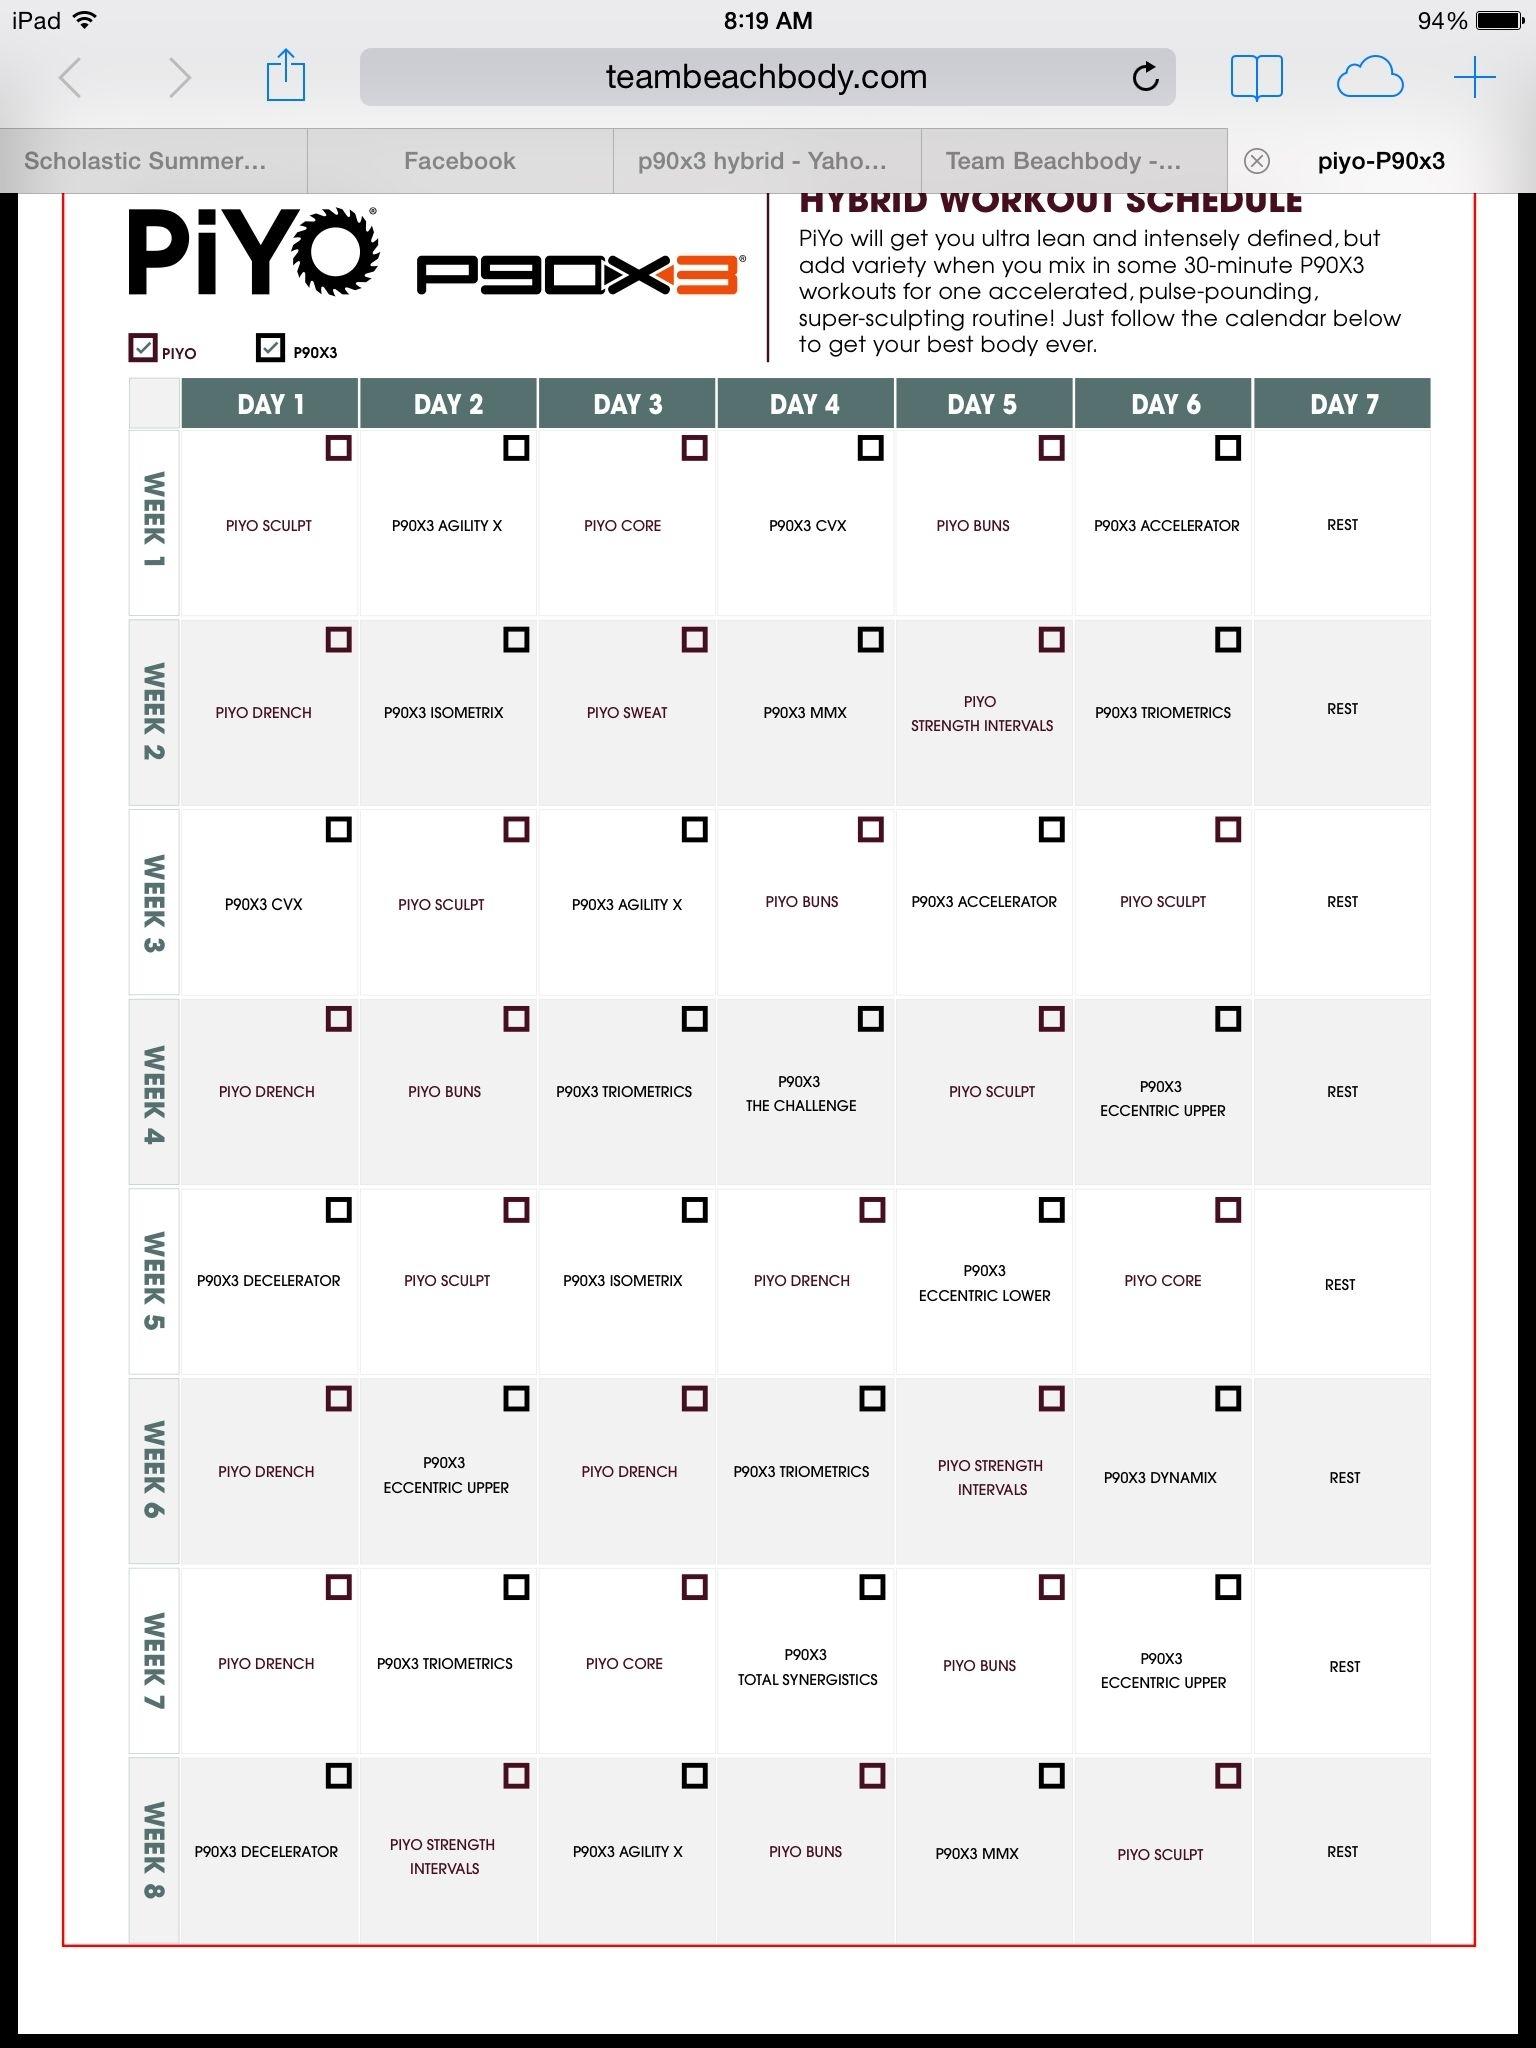 Piyo/p90X3 Hybrid | T25 Workout, Workout Schedule, Workout